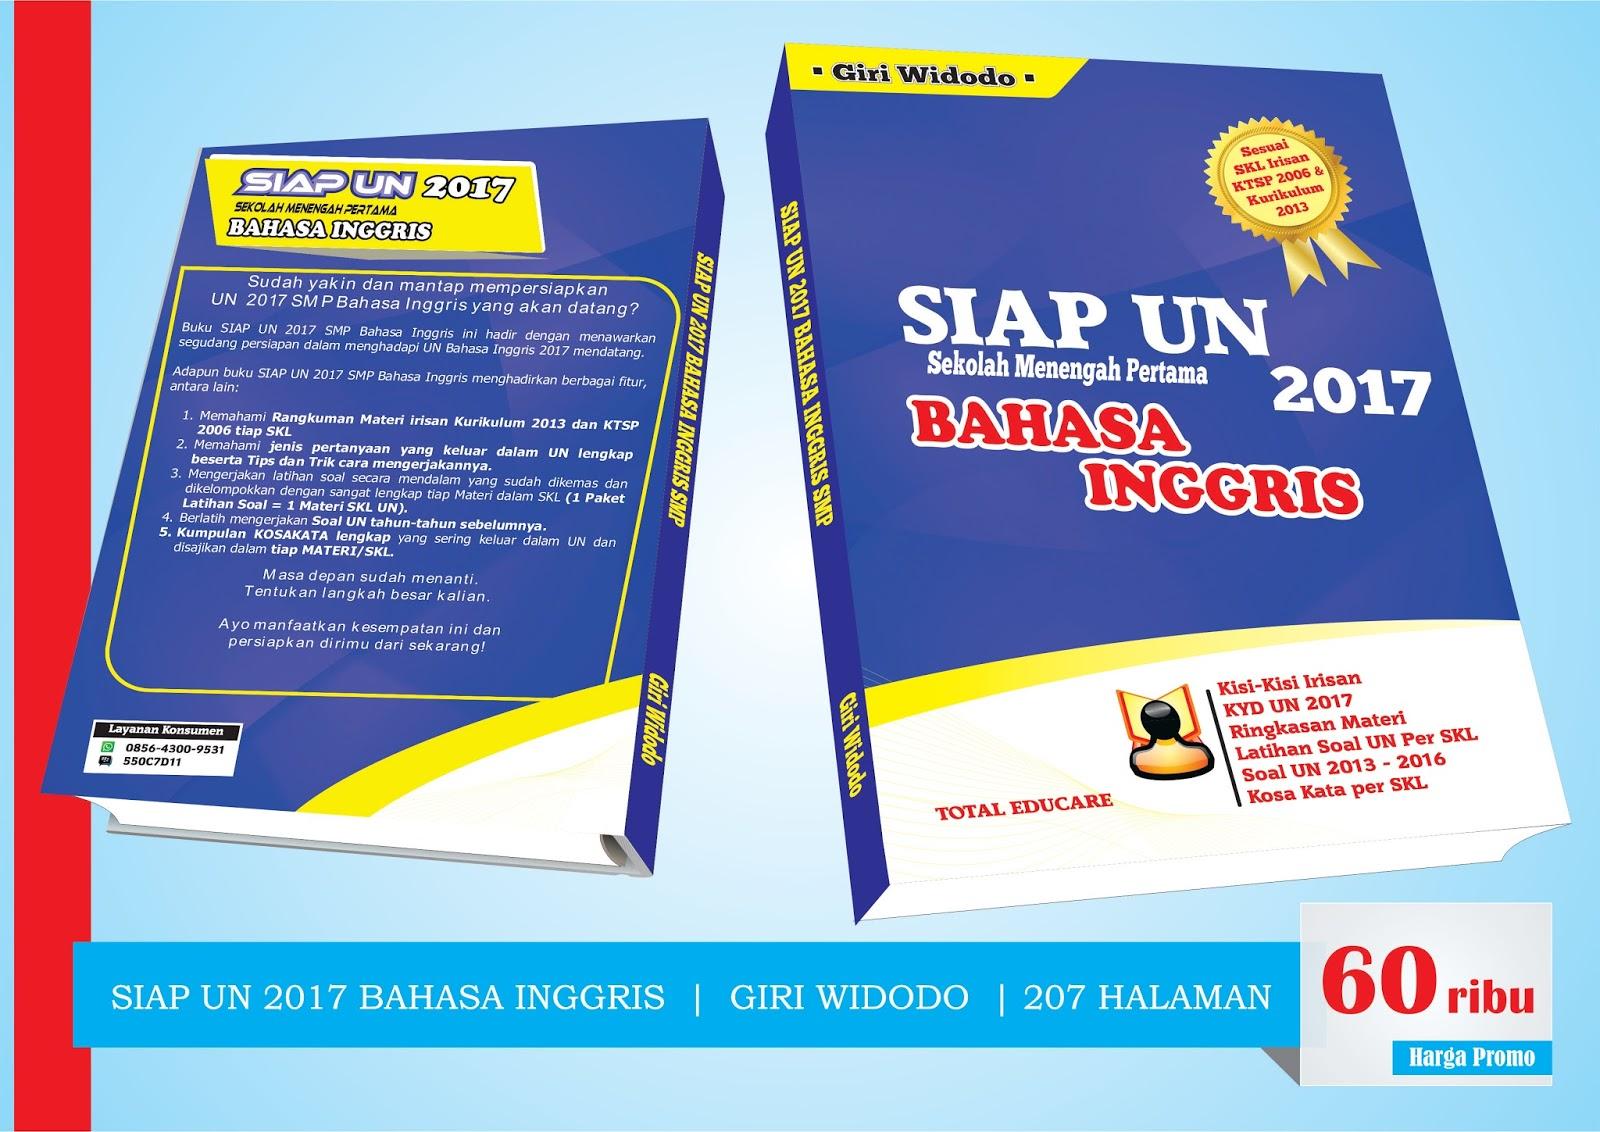 Modul Siap Un 2017 Bahasa Inggris Smp Giri Widodo